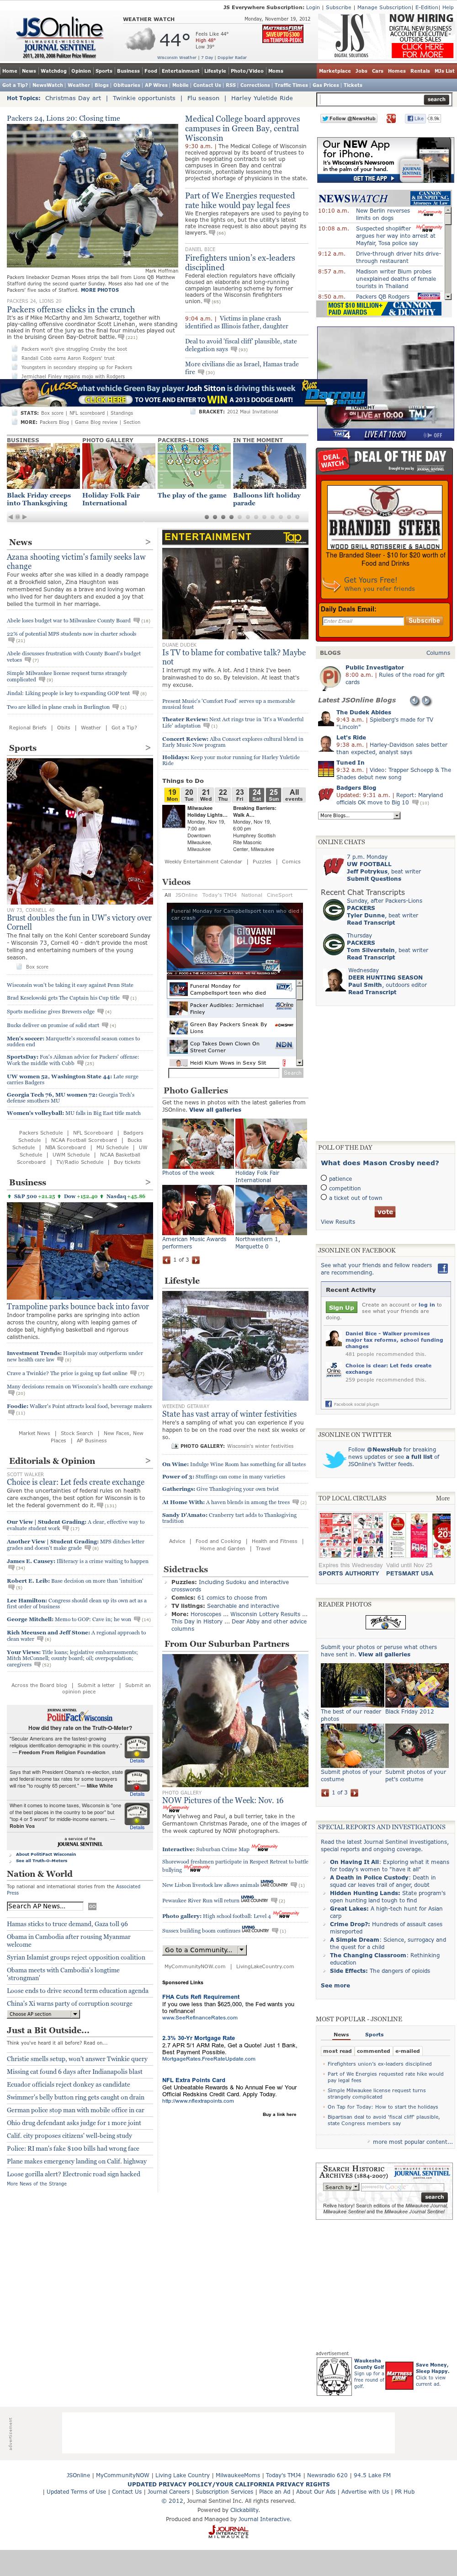 Milwaukee Journal Sentinel at Monday Nov. 19, 2012, 4:19 p.m. UTC